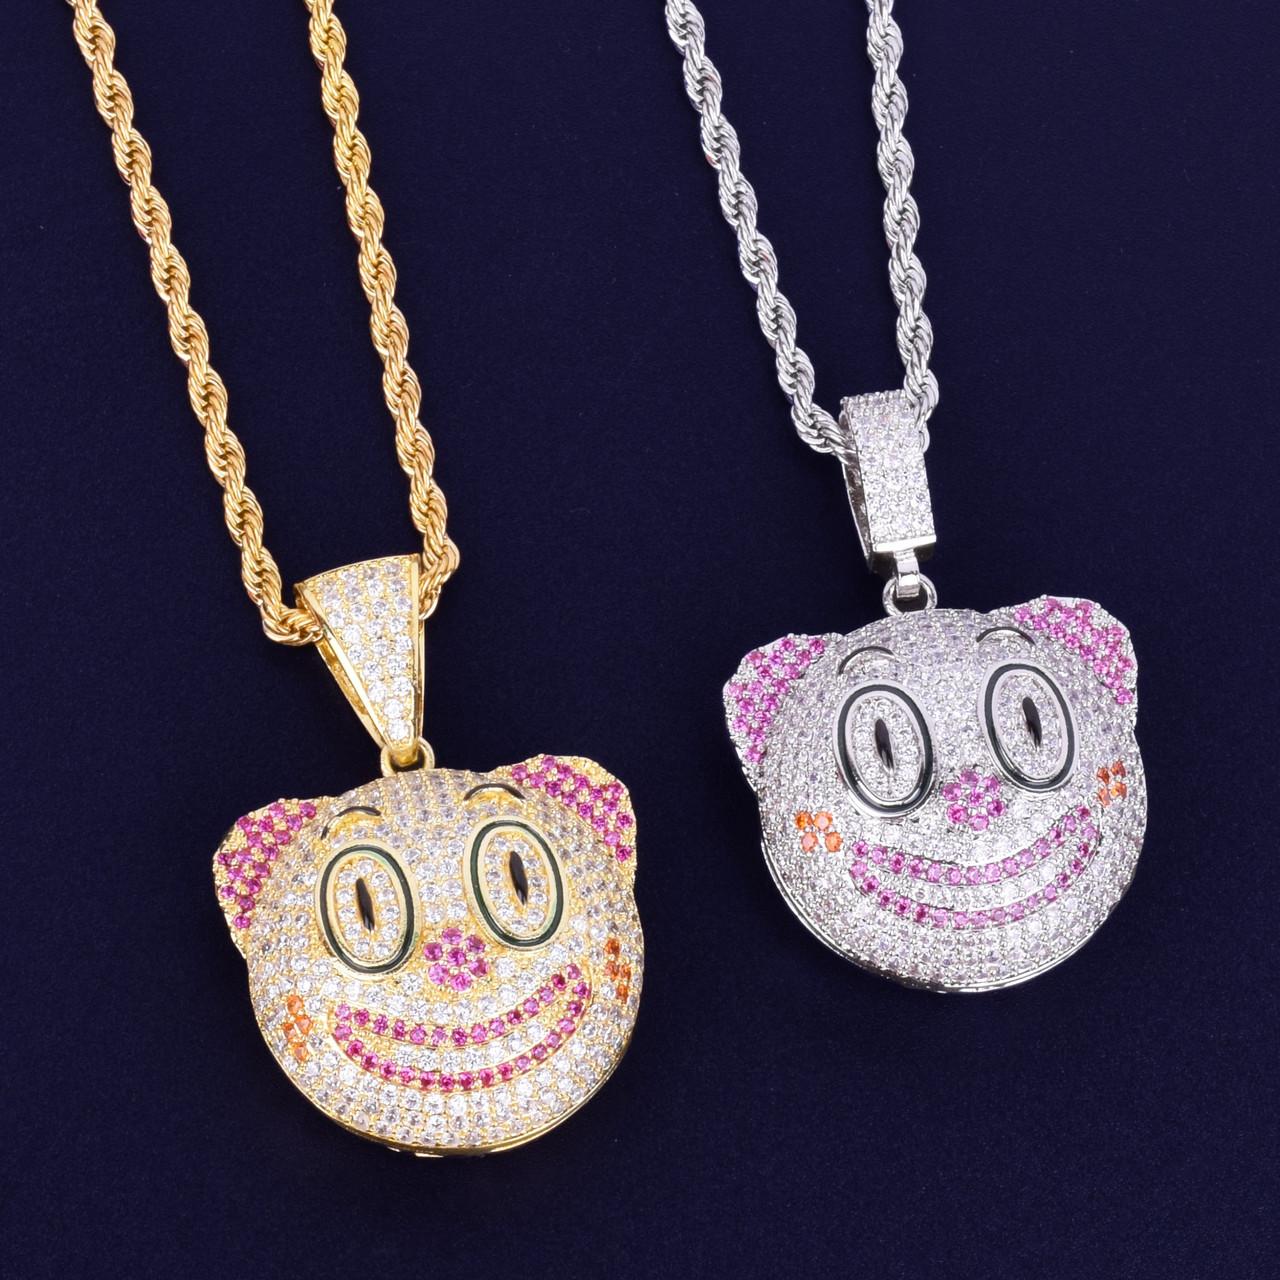 85d3771ab31f4 Hip Hop Clown Face Emoji Micro Pave Lab Diamond Pendant Chain Necklace